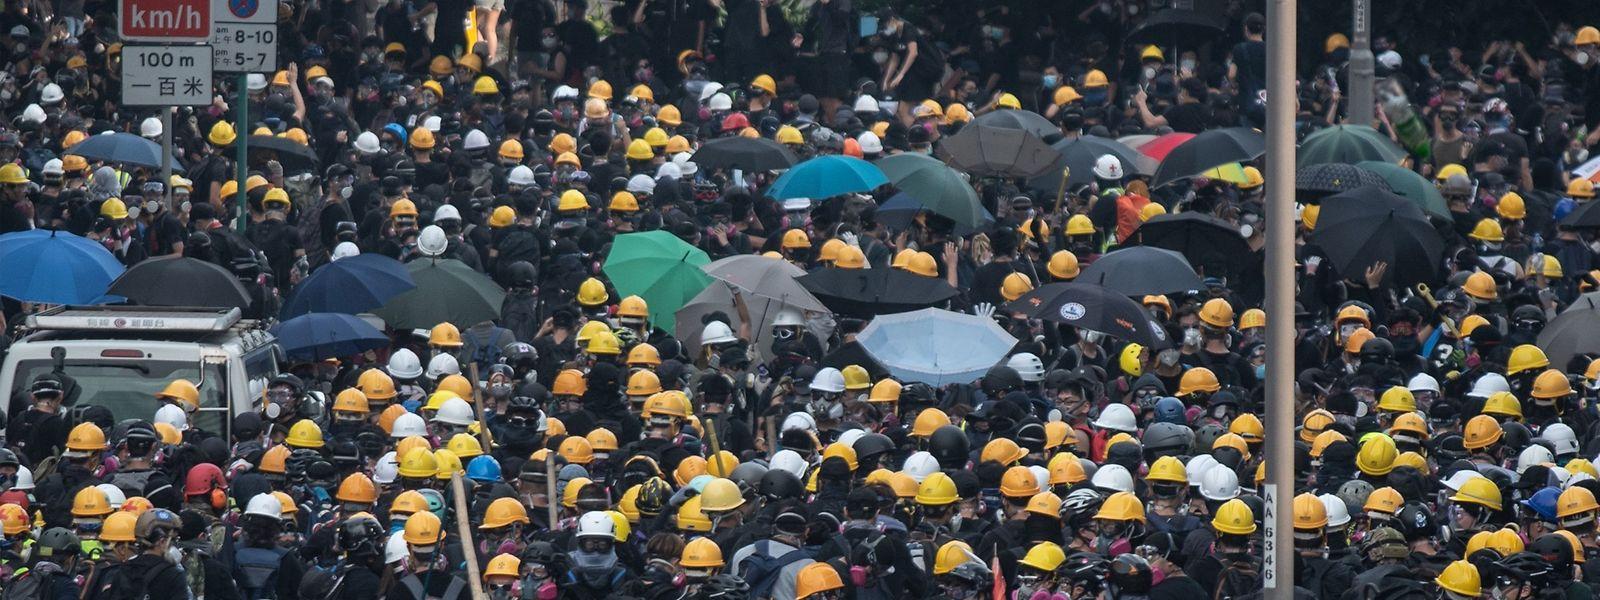 Die Massenproteste in Hongkong dauern bereits seit elf Wochen an.